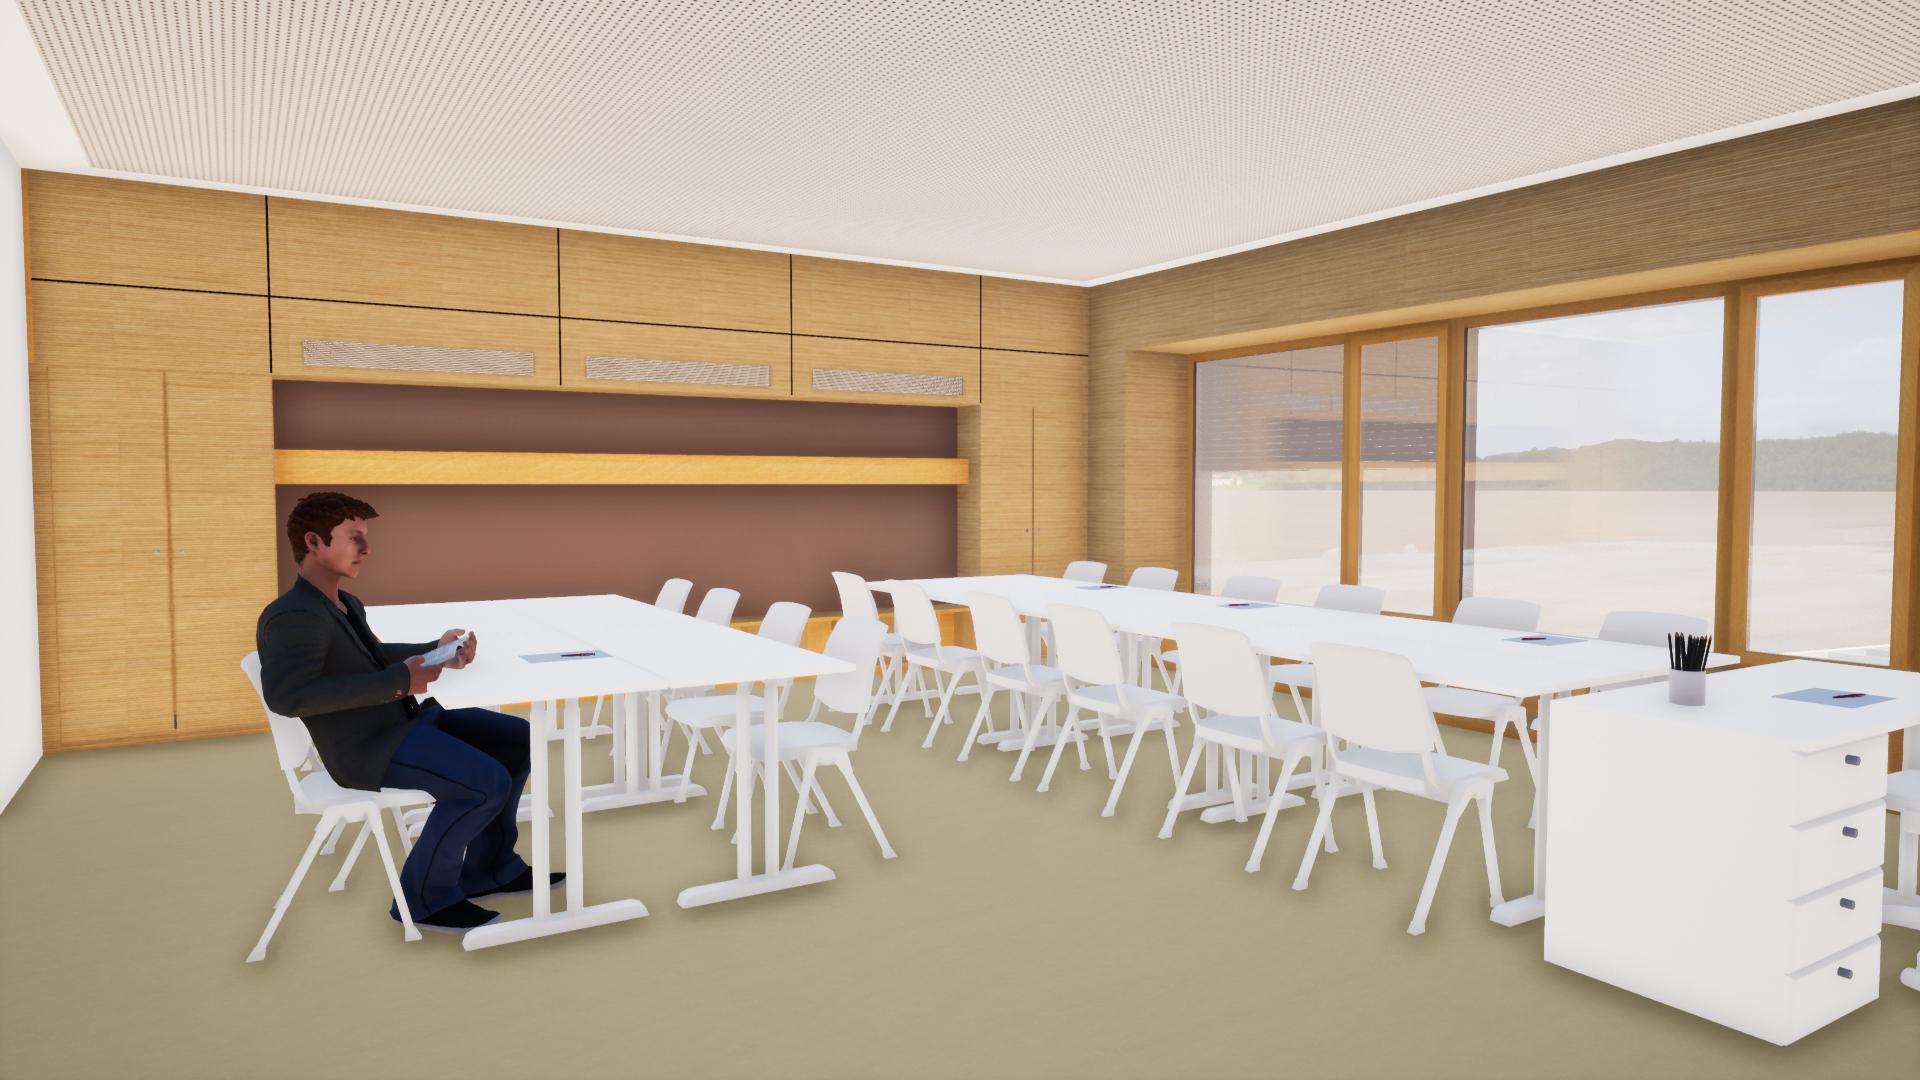 Bürgerversammlung Klassenzimmer Schulneubau